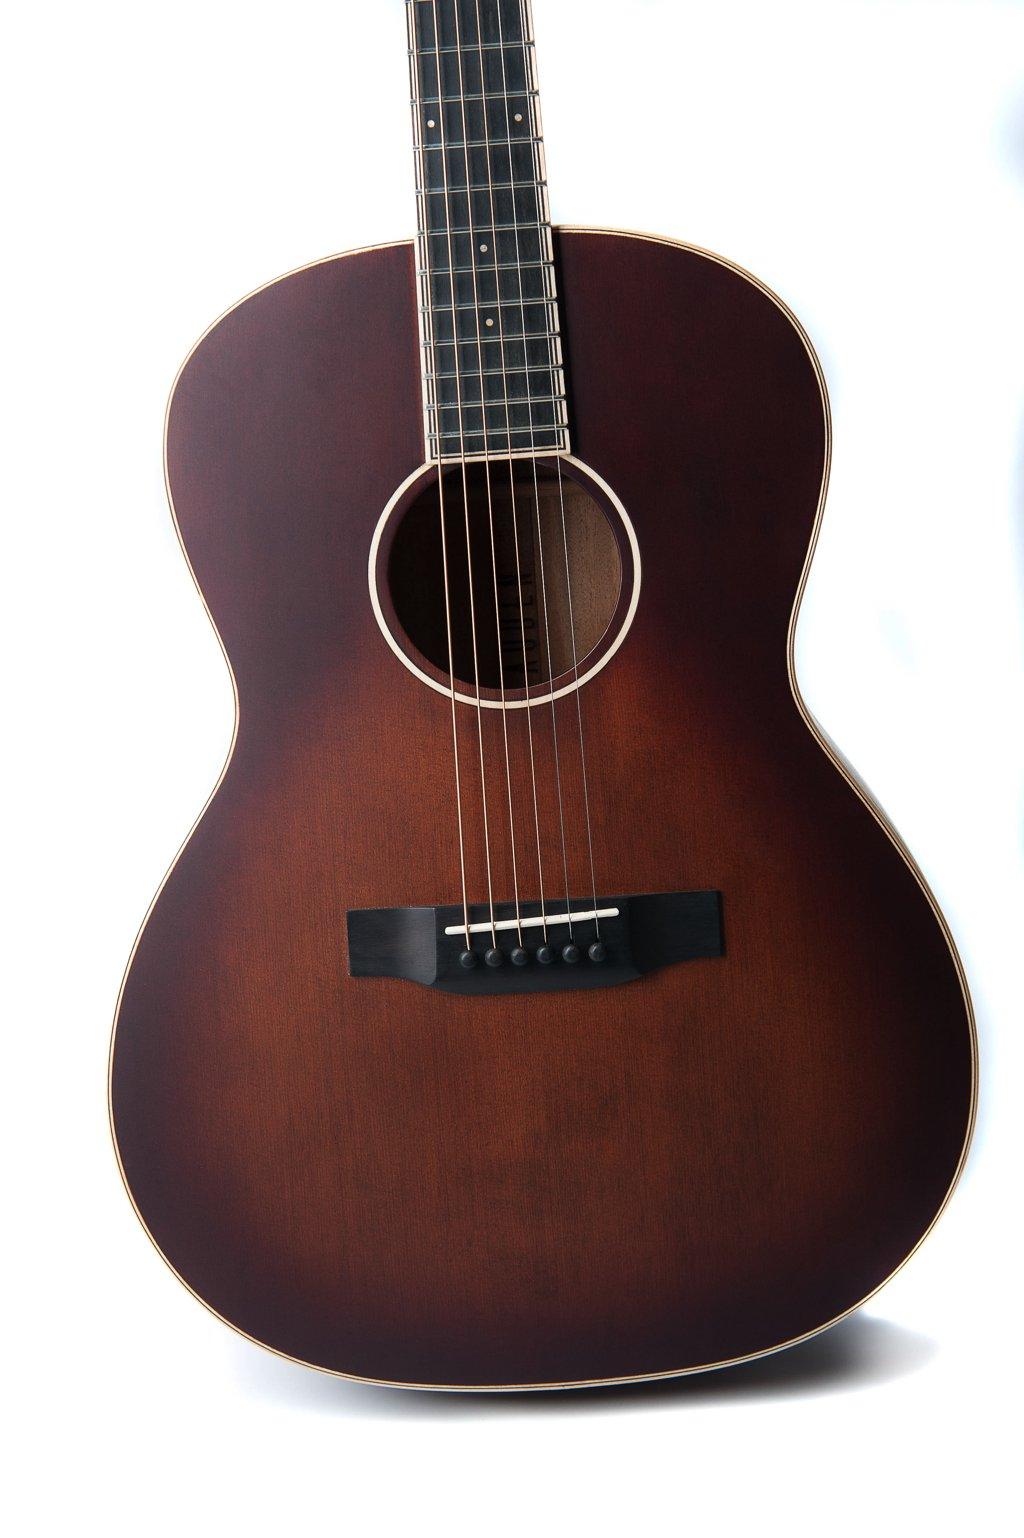 Julia acoustic guitar by Auden Guitars - jaunty front angle